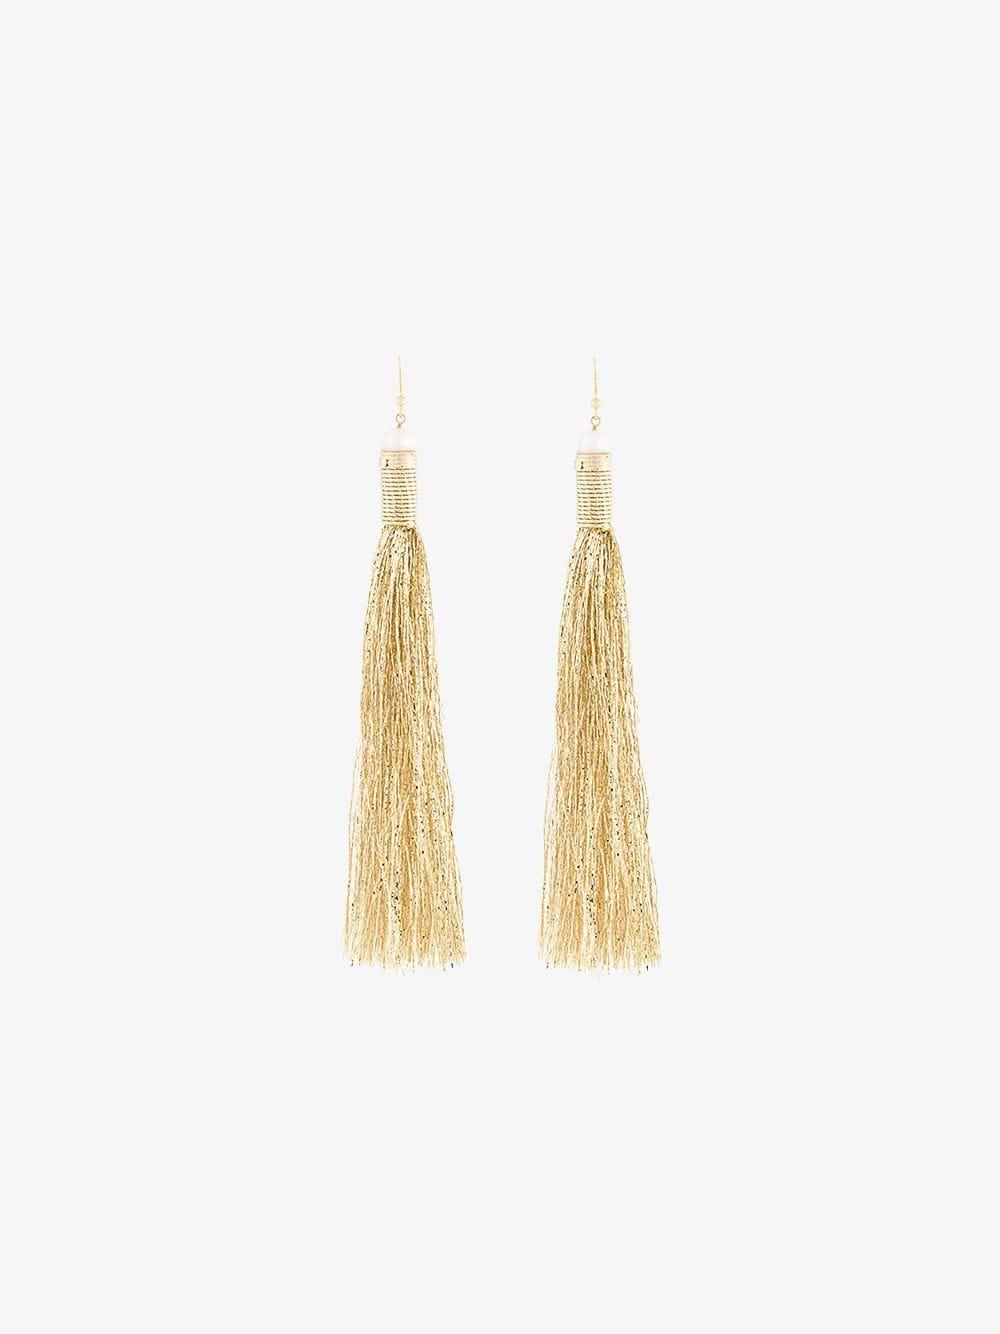 Rosantica Maori tassel earrings in metallic